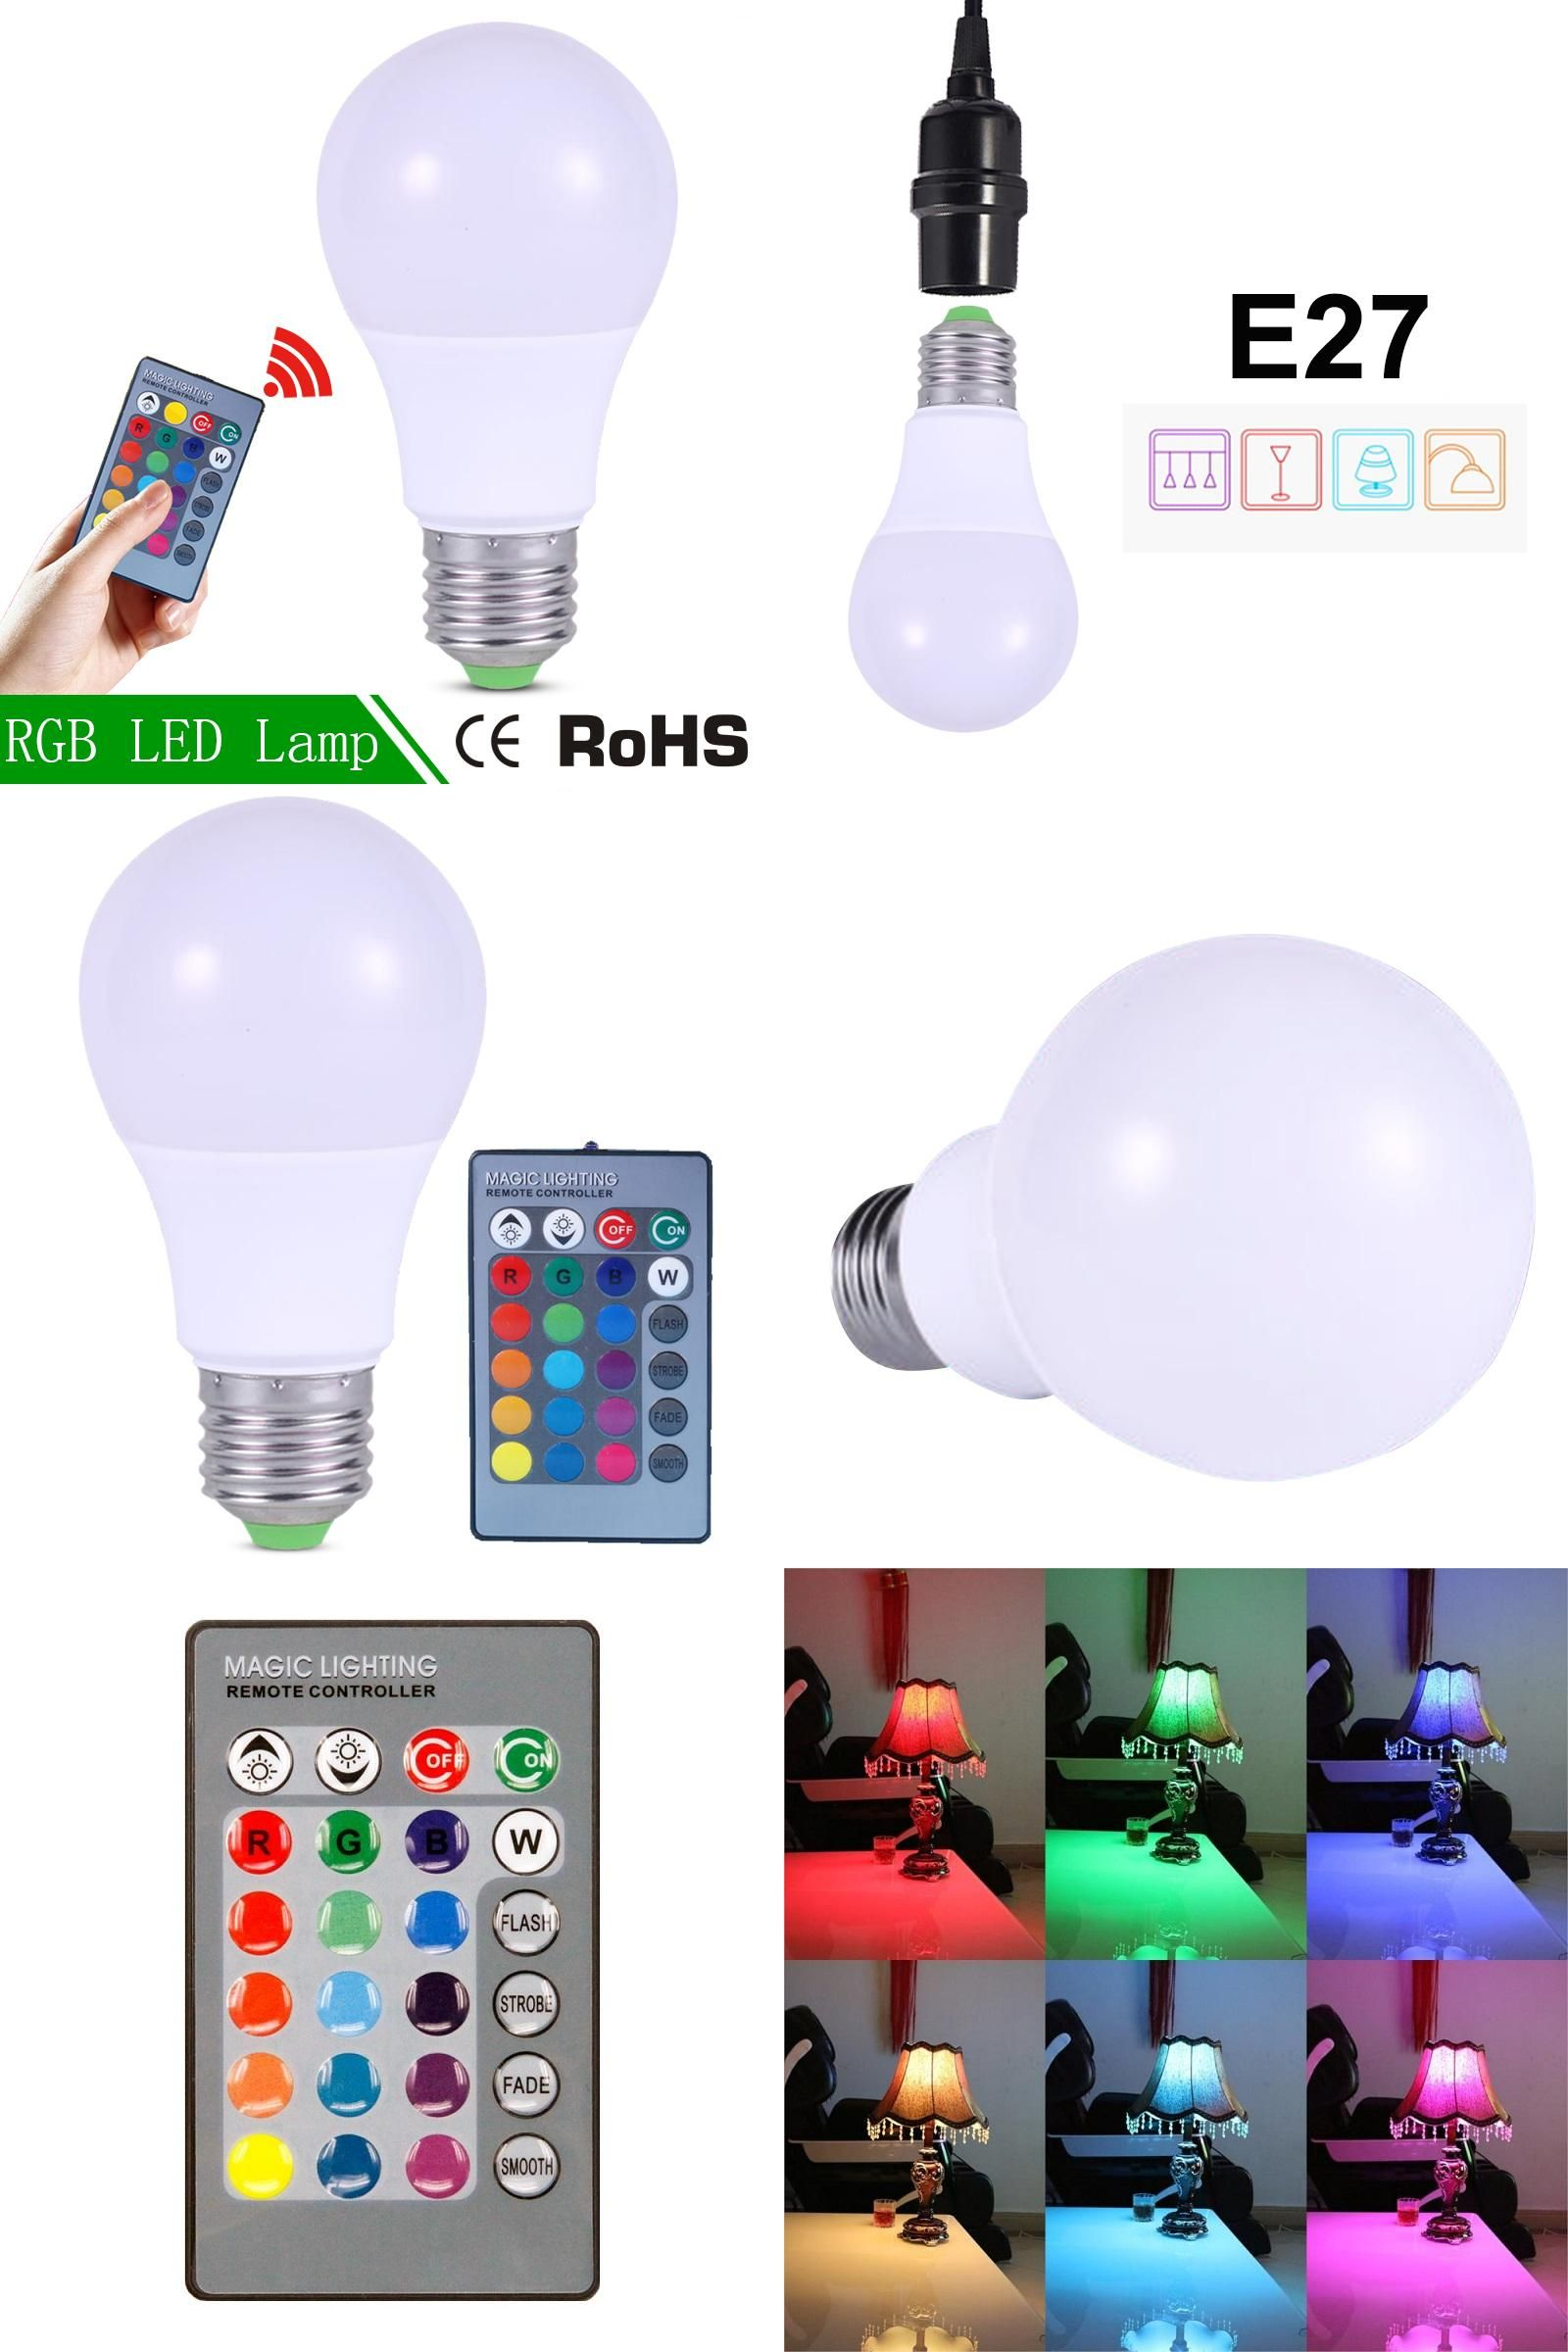 Visit to Buy] RGB LED Lampada 3W LED Lamp 220V Mini High Power